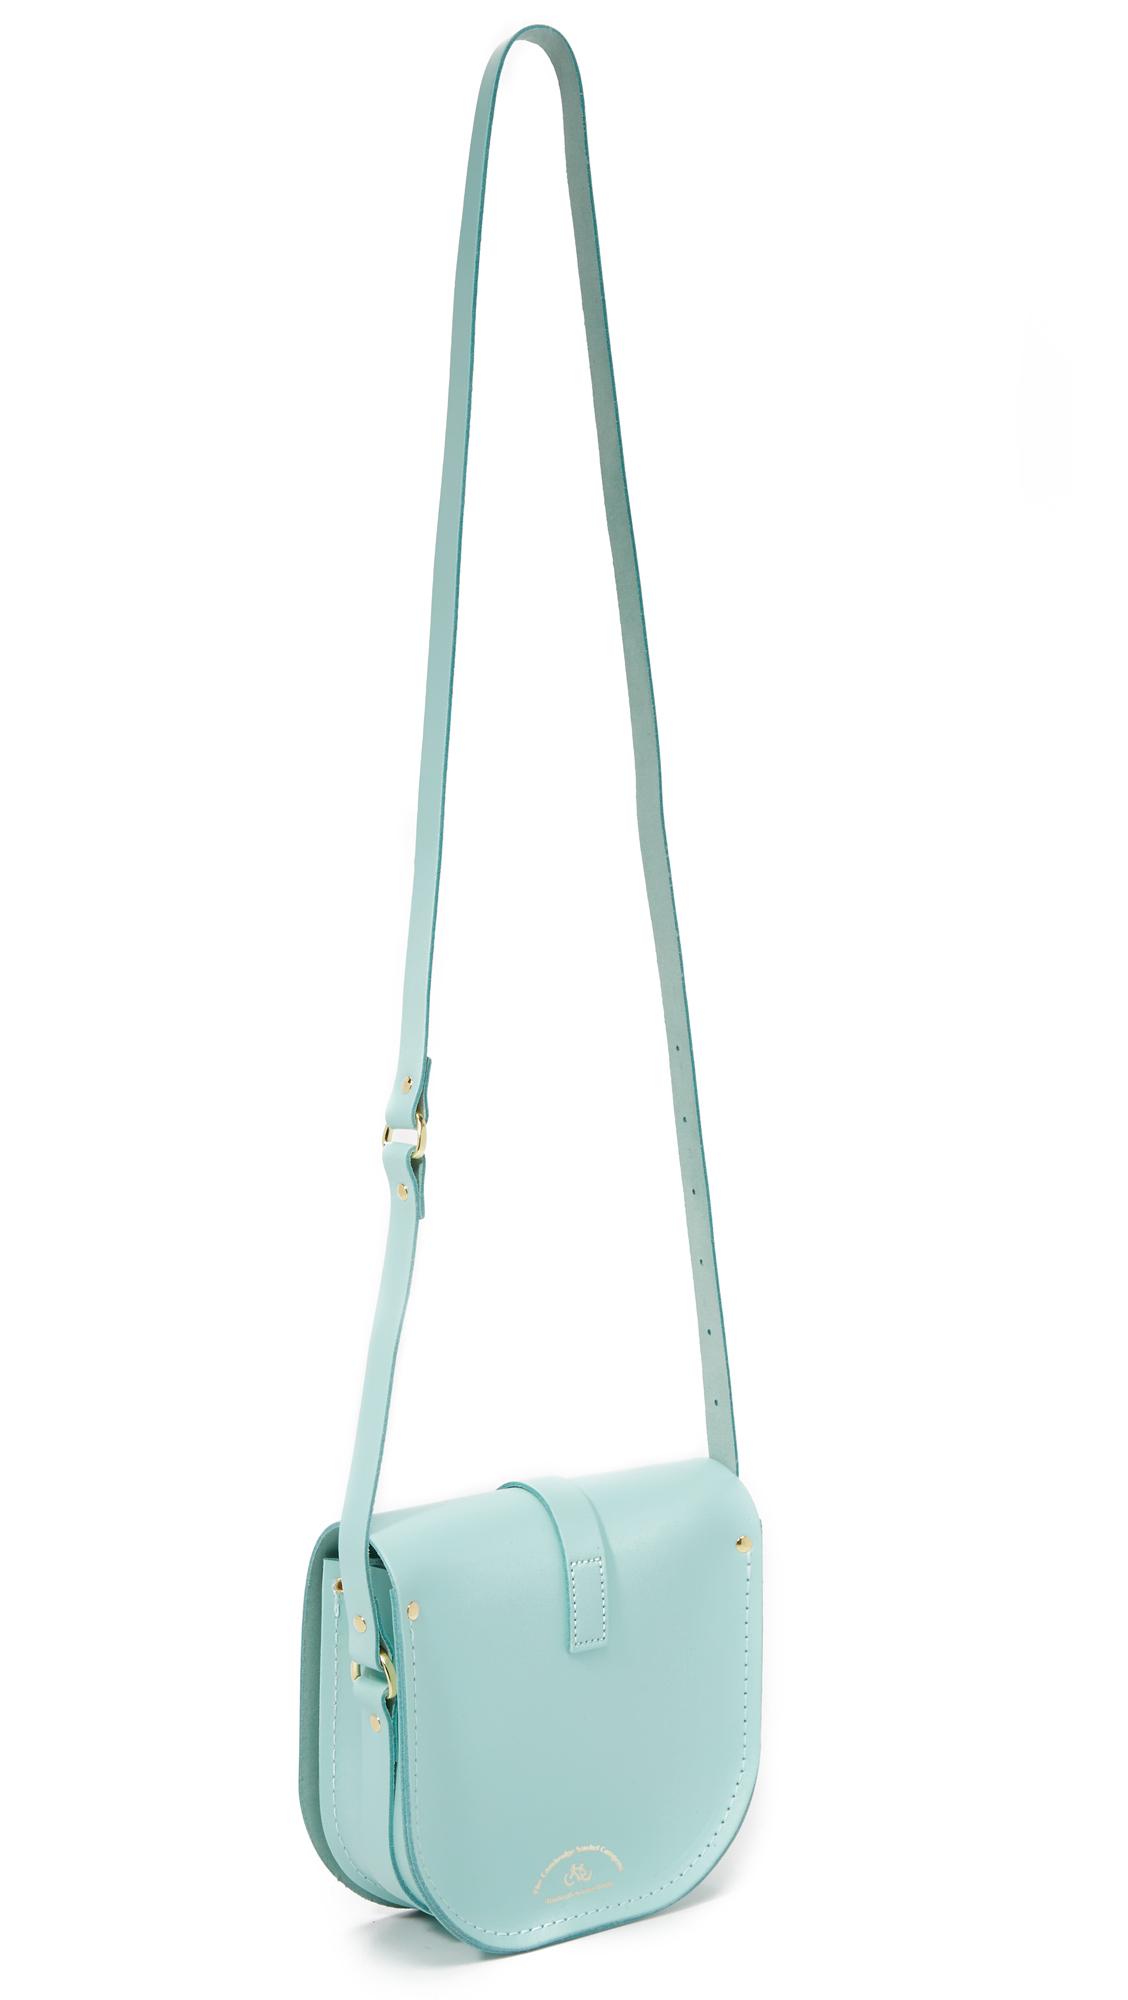 Cambridge satchel company Saddle Bag | Lyst